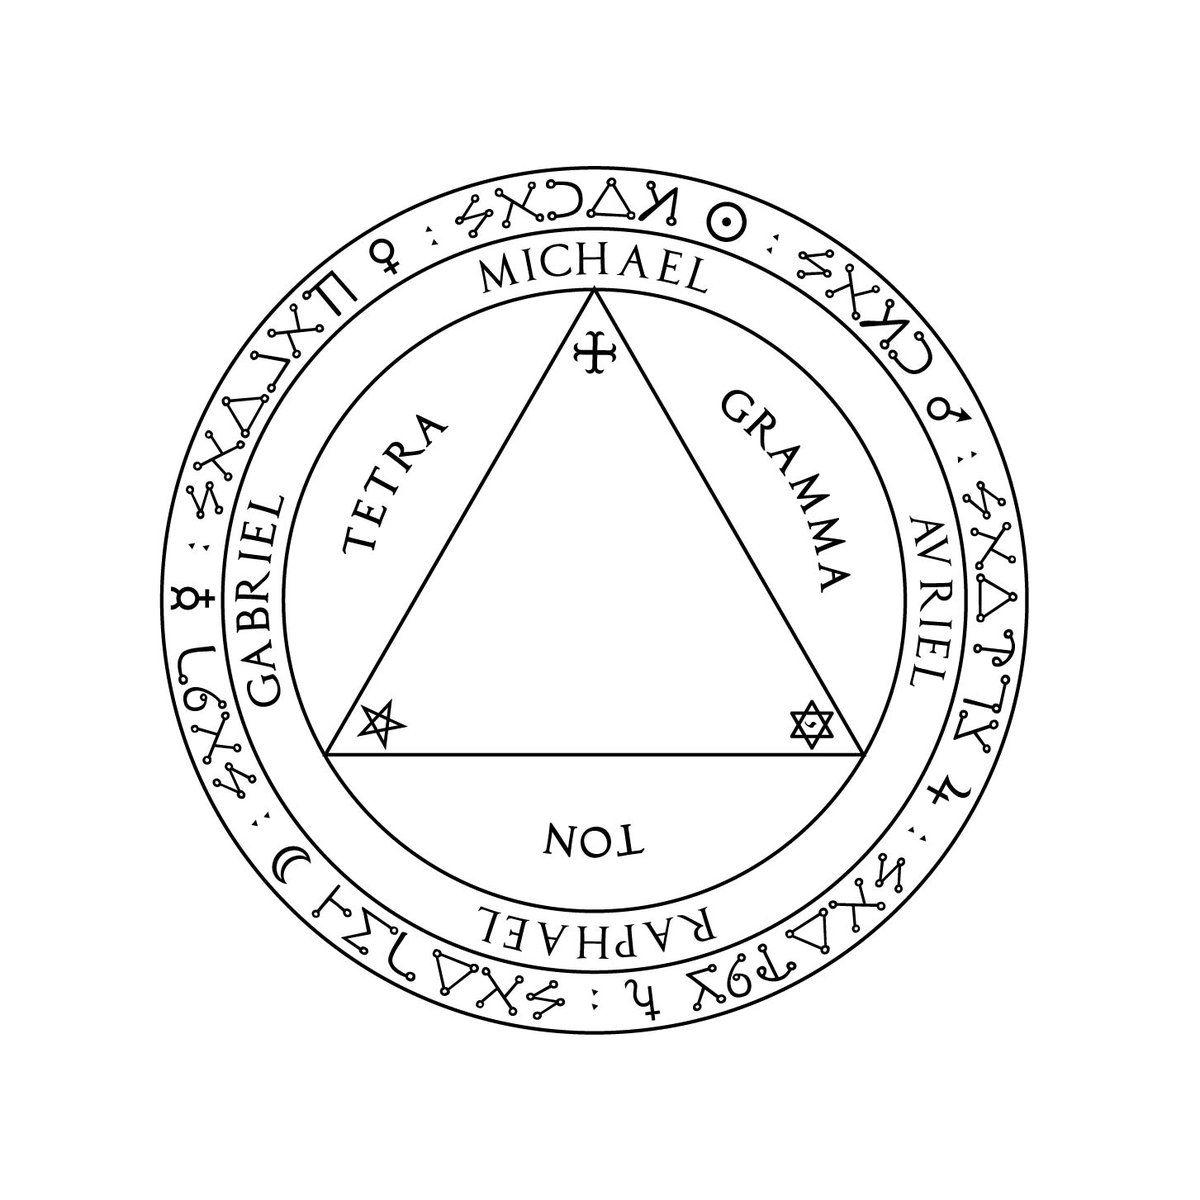 Image result for tetragrammaton wjh pinterest explore witch symbols magic symbols and more buycottarizona Image collections